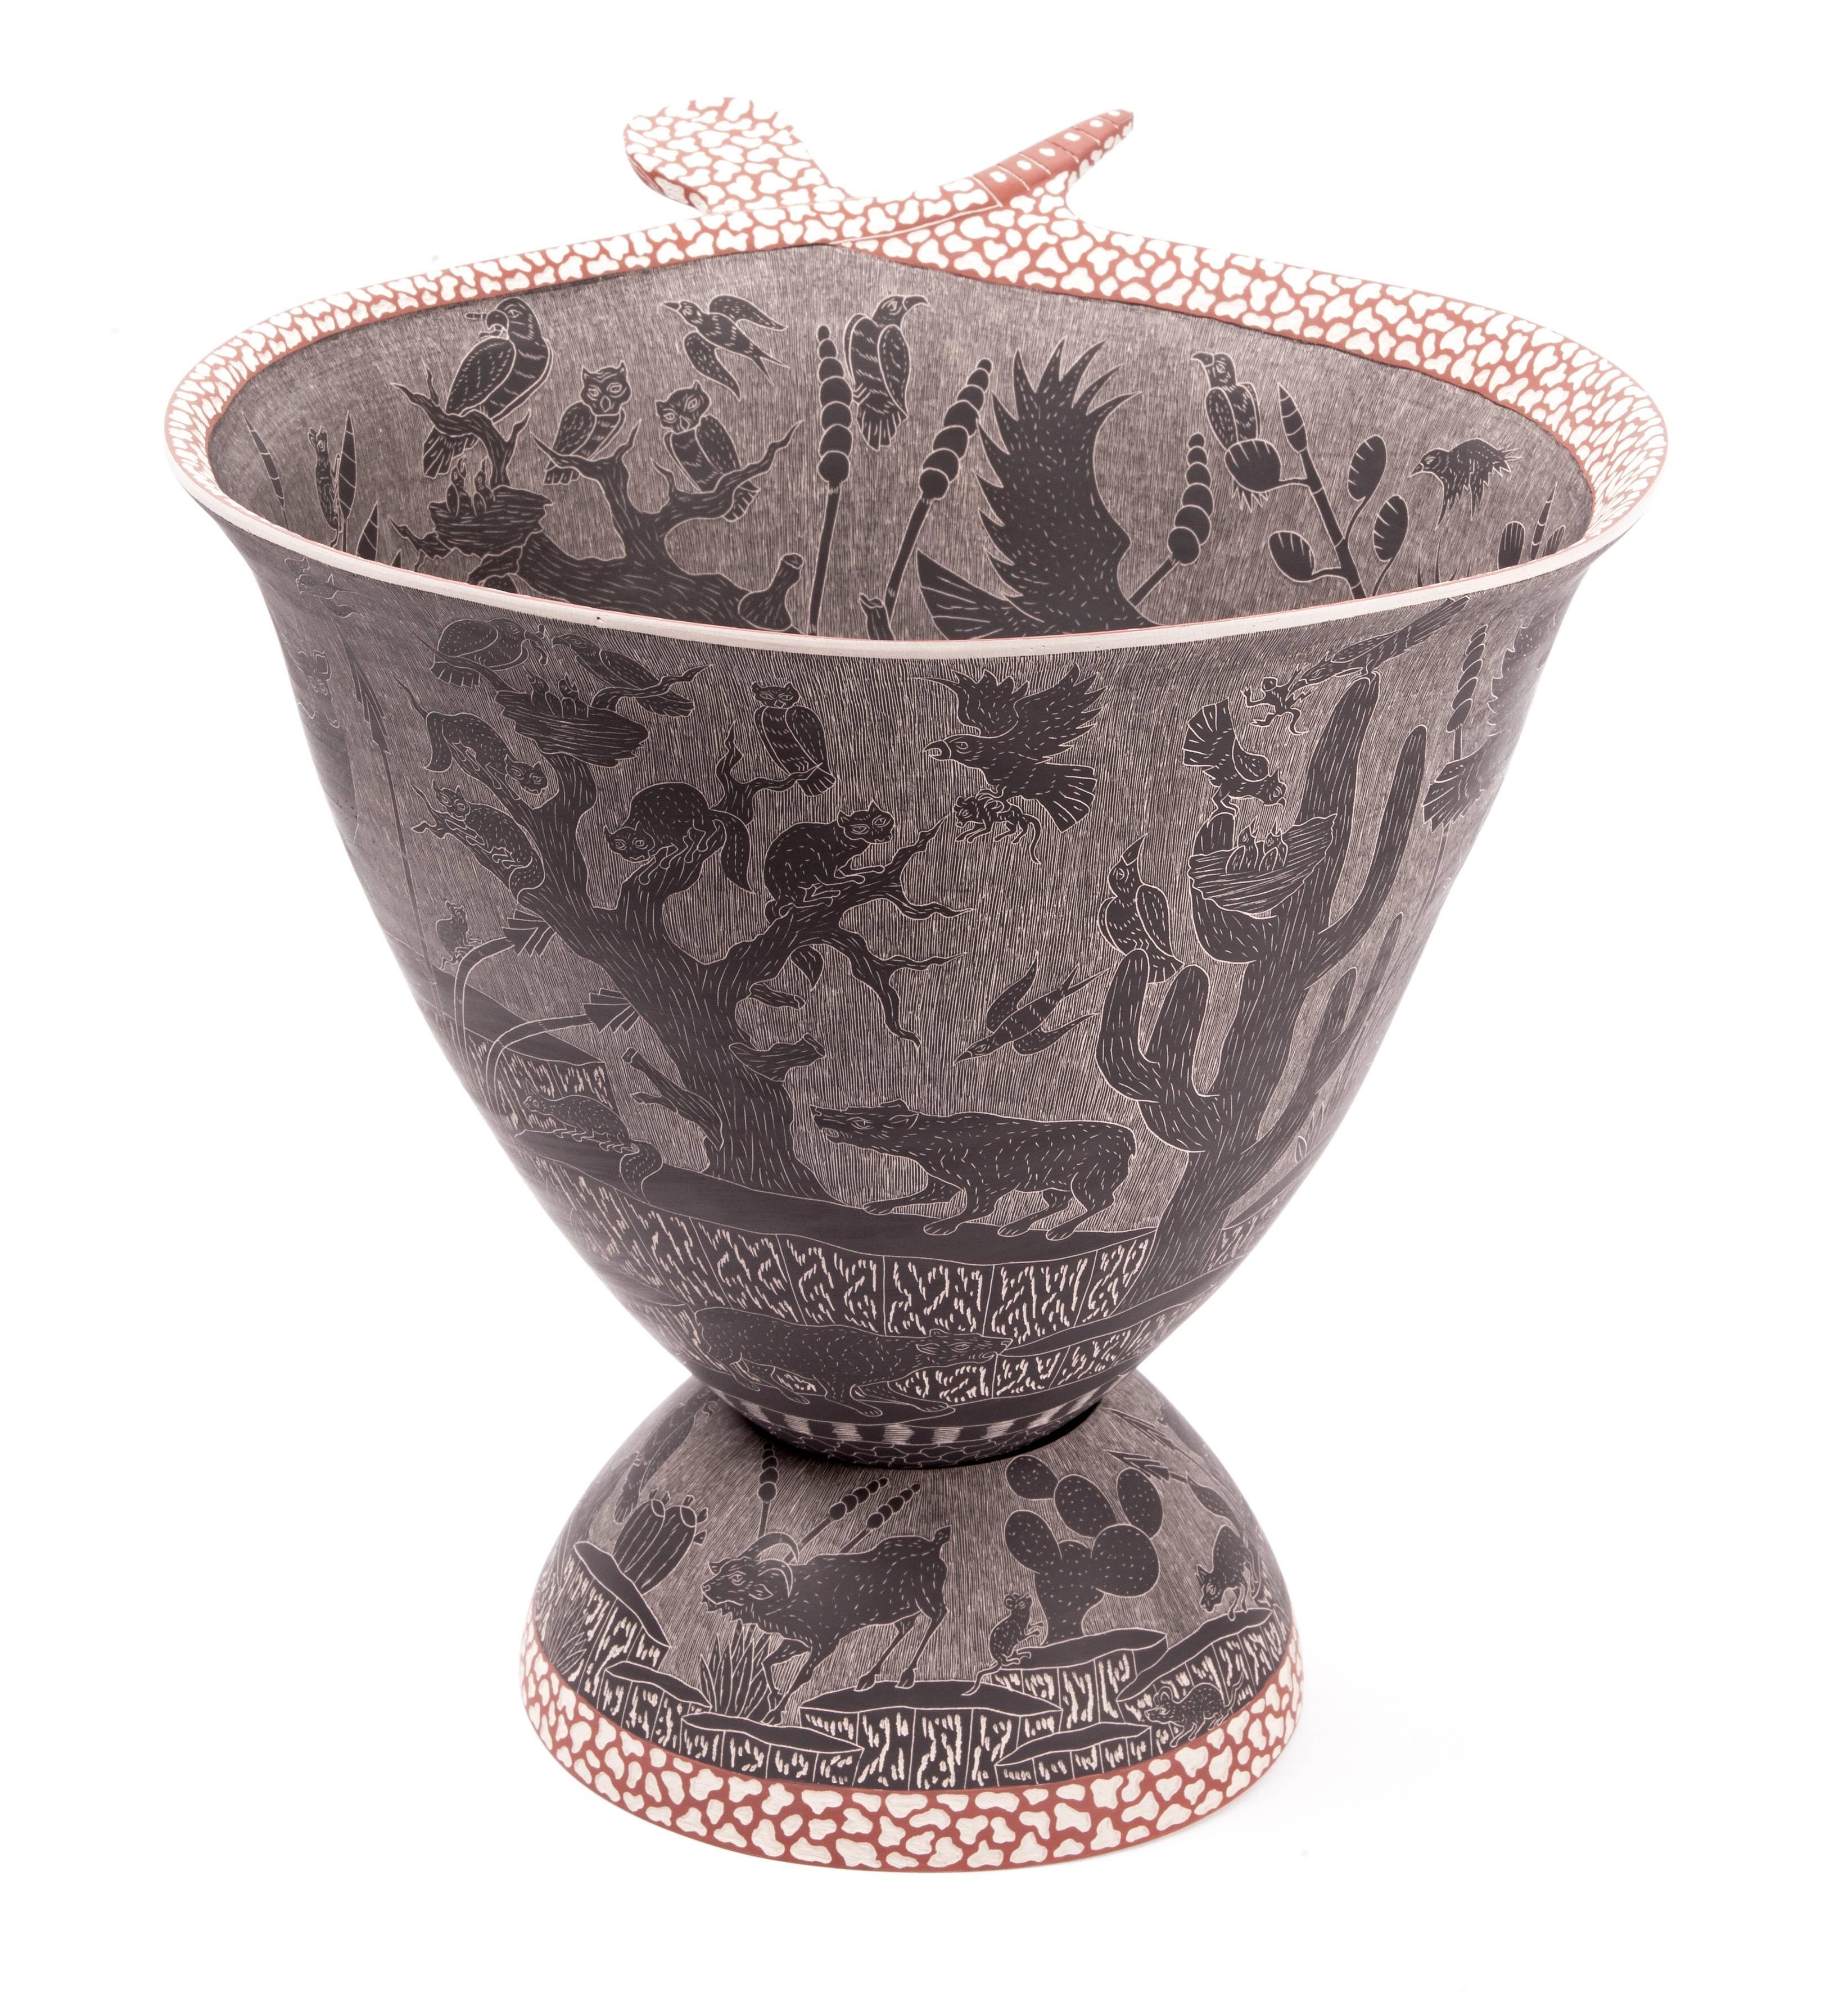 15'' Vasija Nocturna / Ceramic Mexican Folk Art from Mata Ortiz